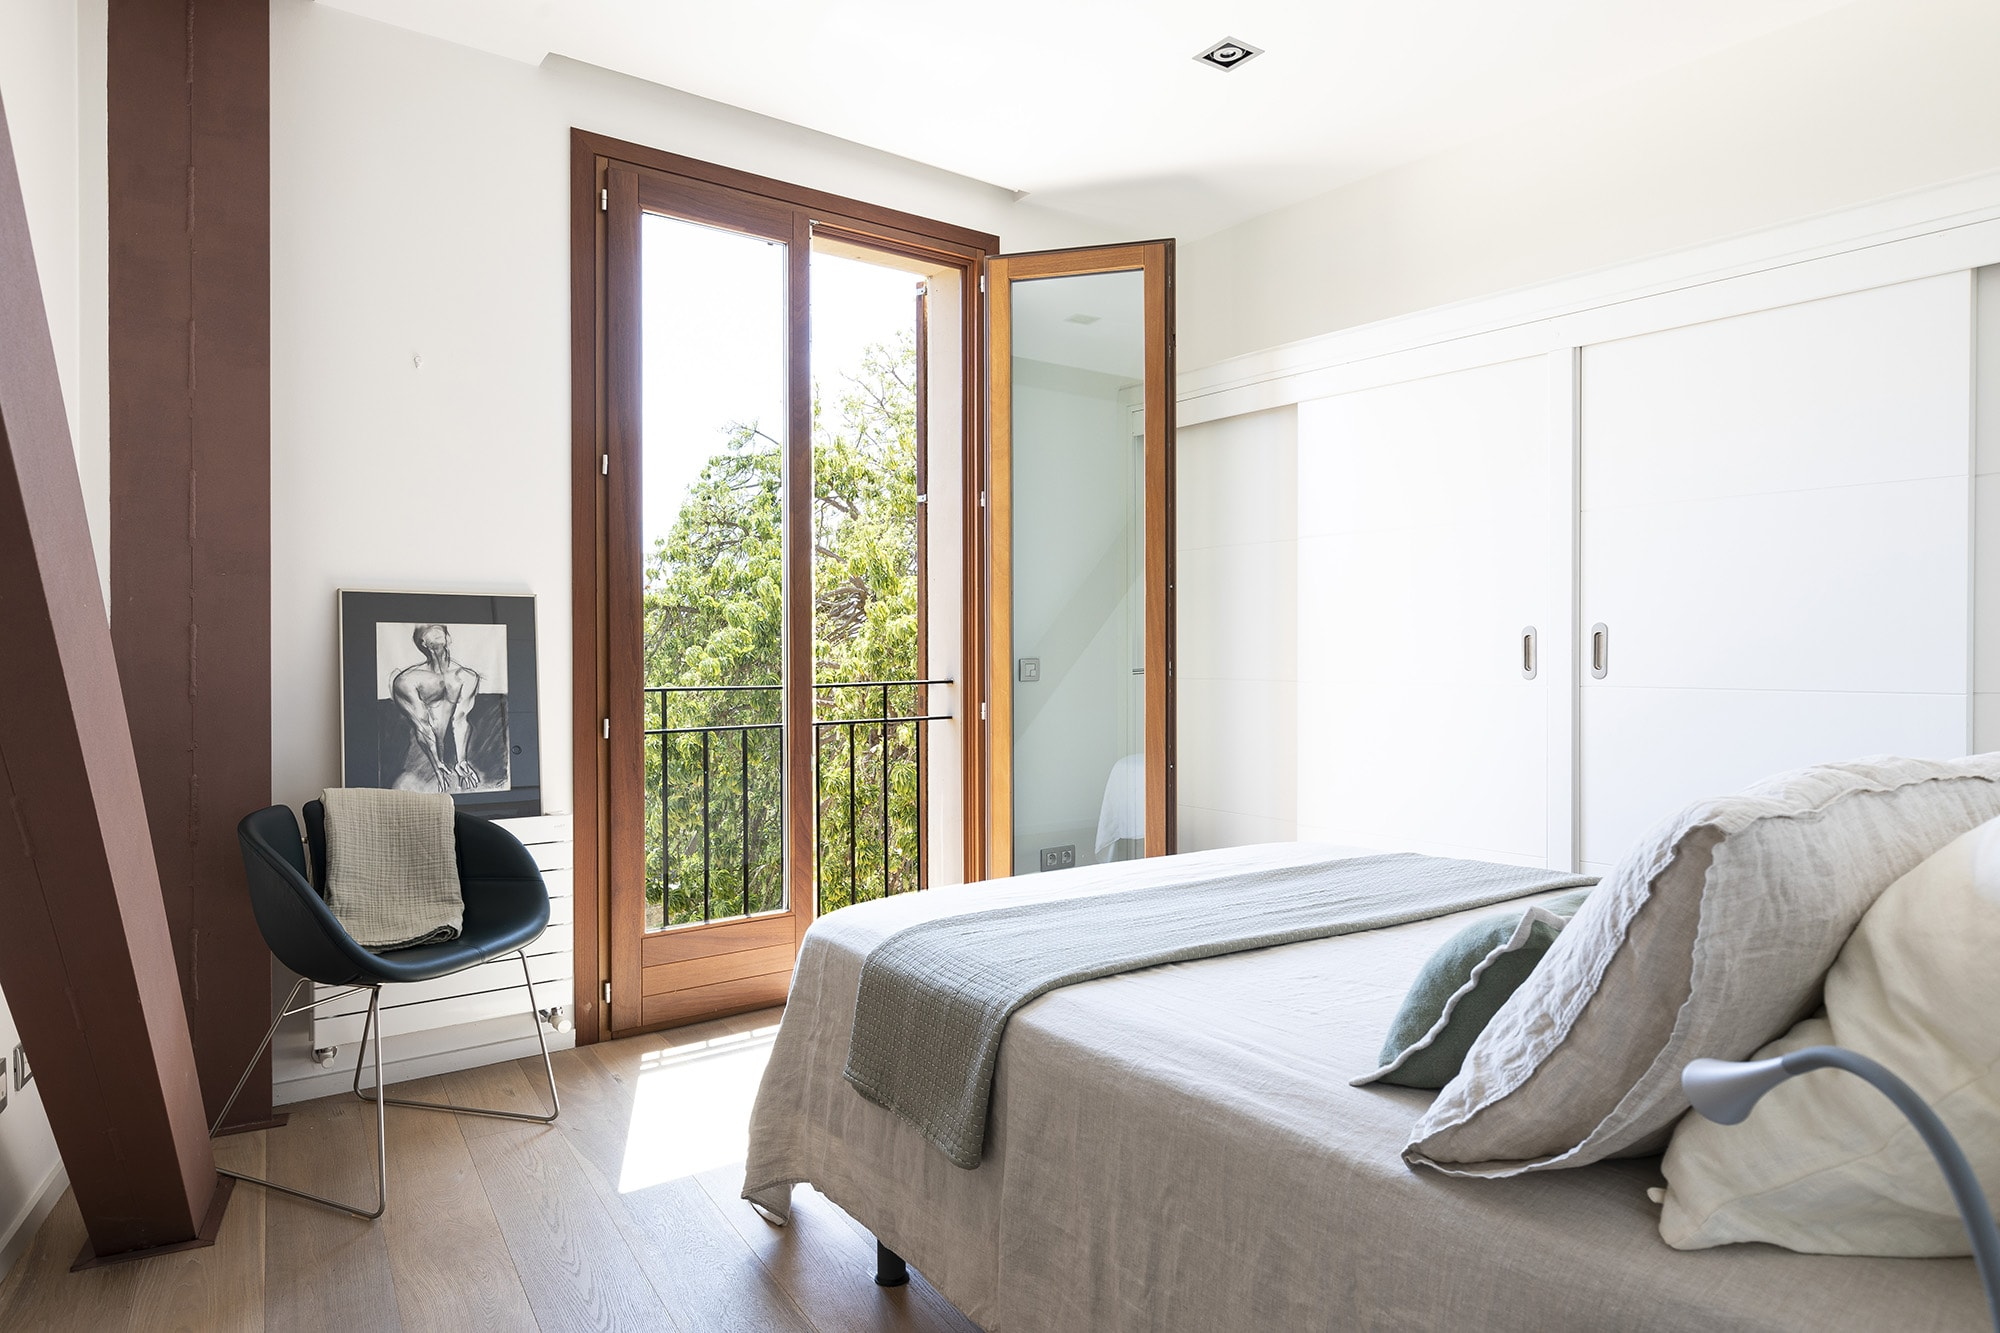 Apartment for sale Palma de Mallorca